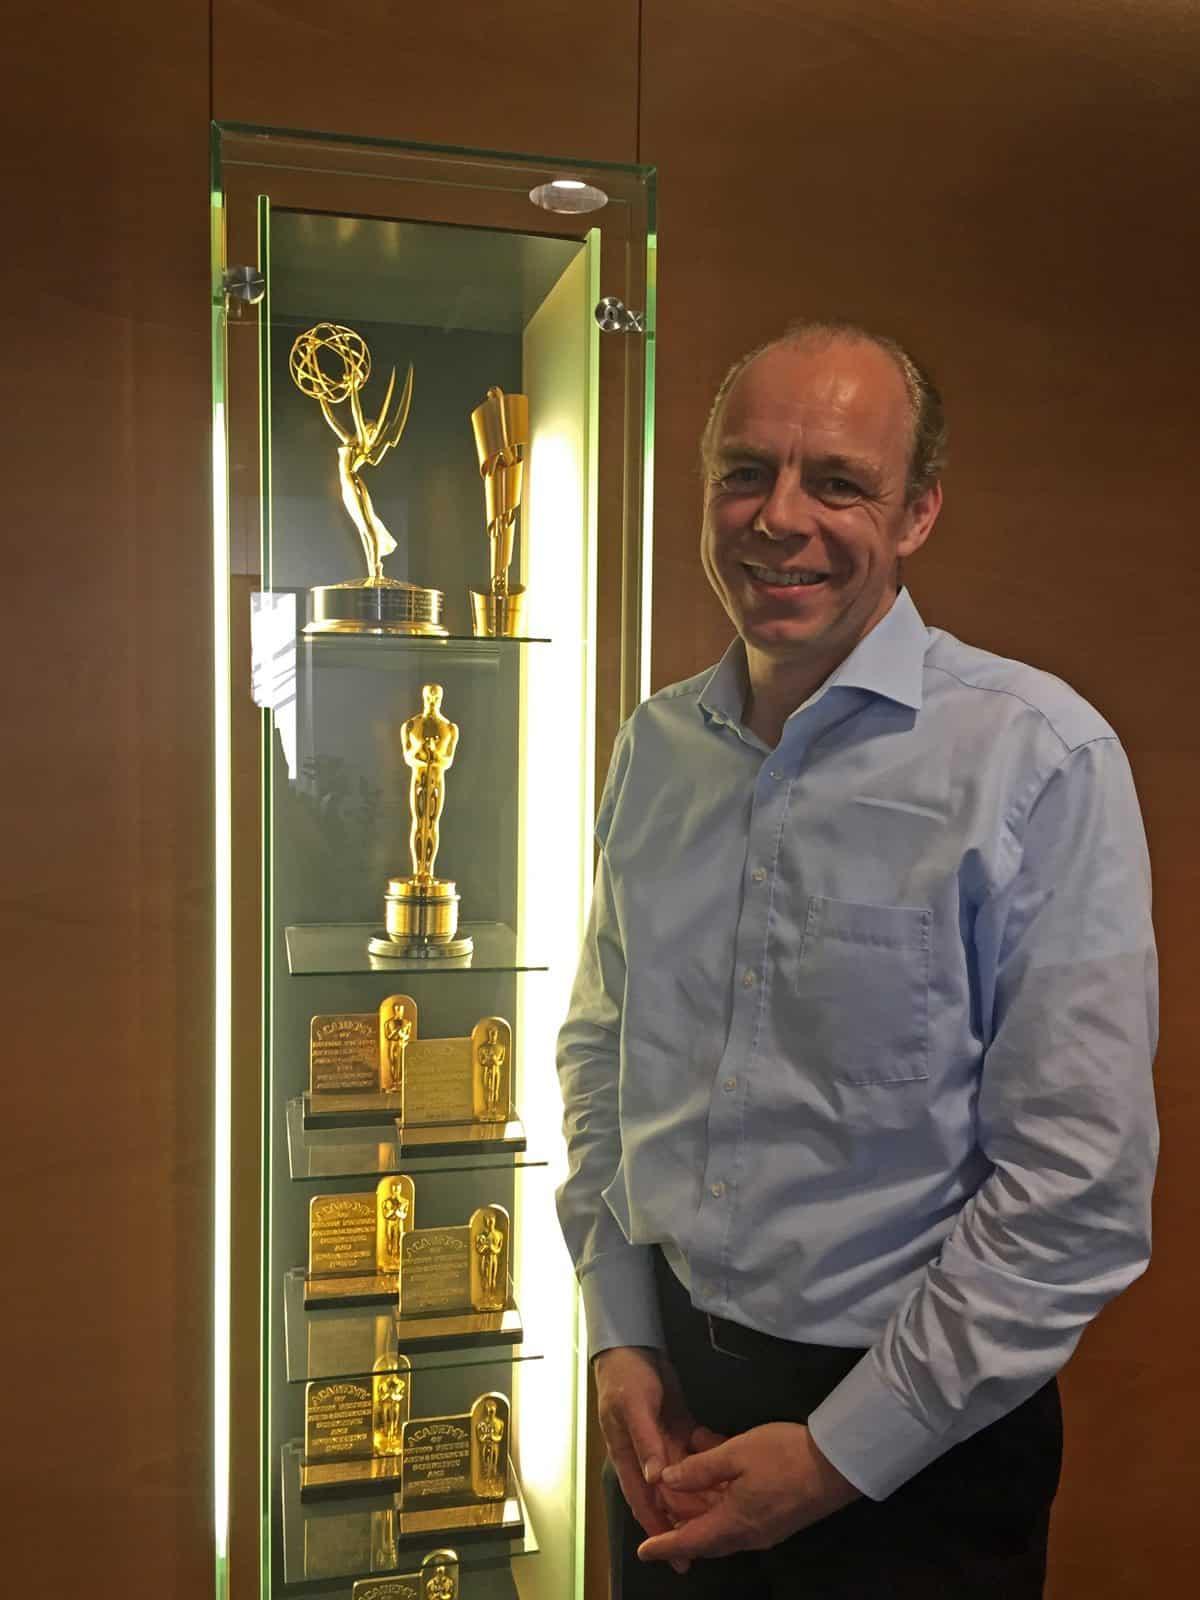 Stephan Schenk beside the ARRI trophy cabinet